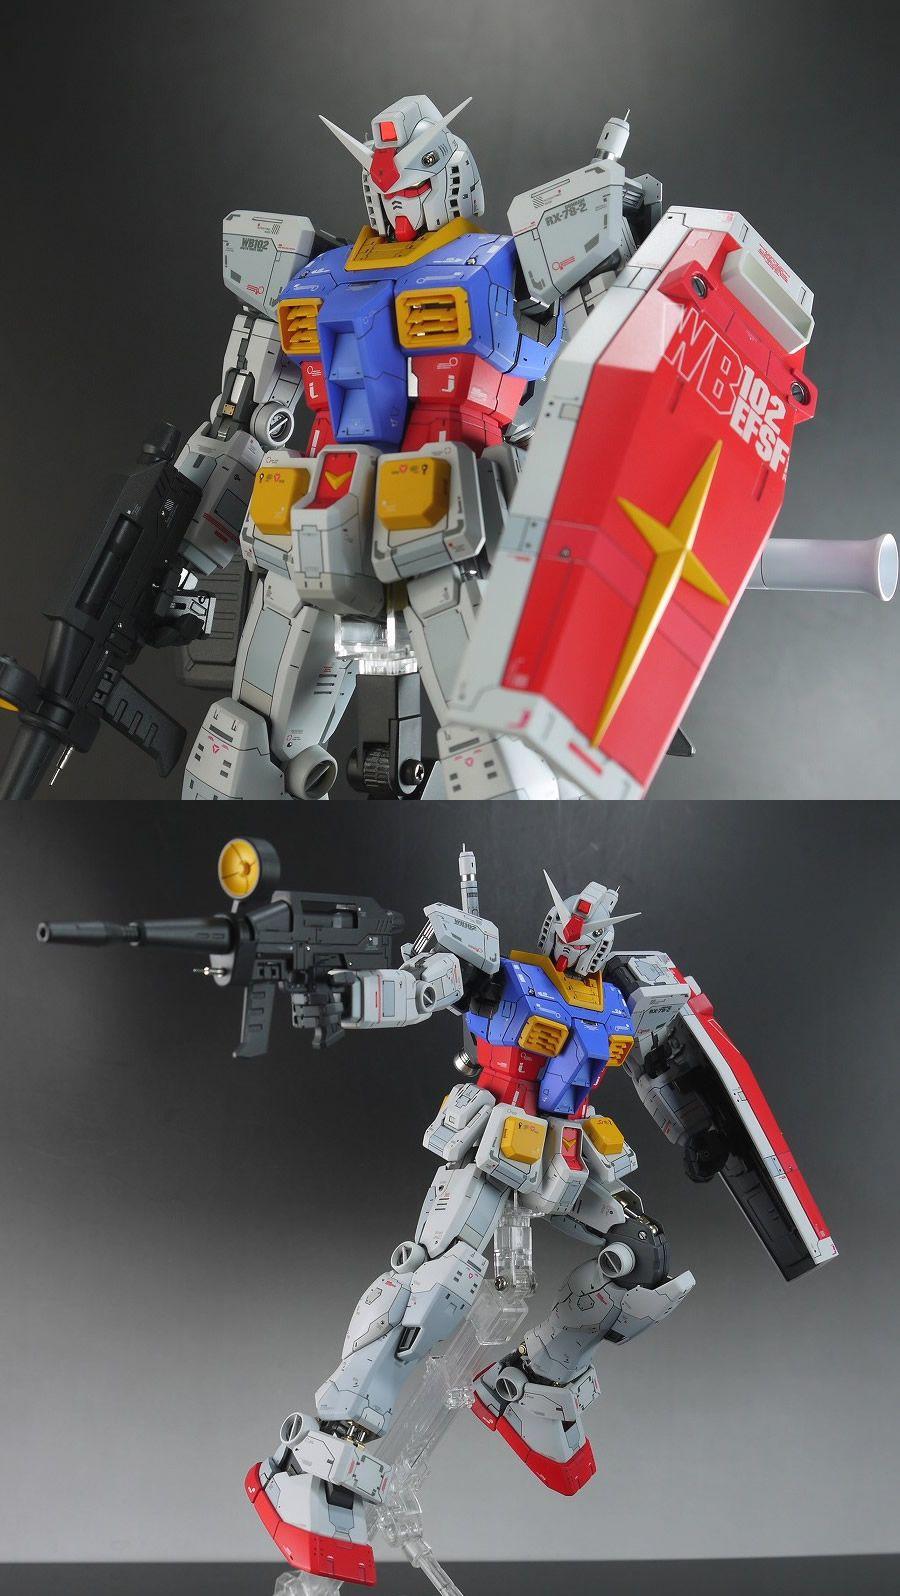 MG 1/100 RX782 Gundam One Year War Customized Build